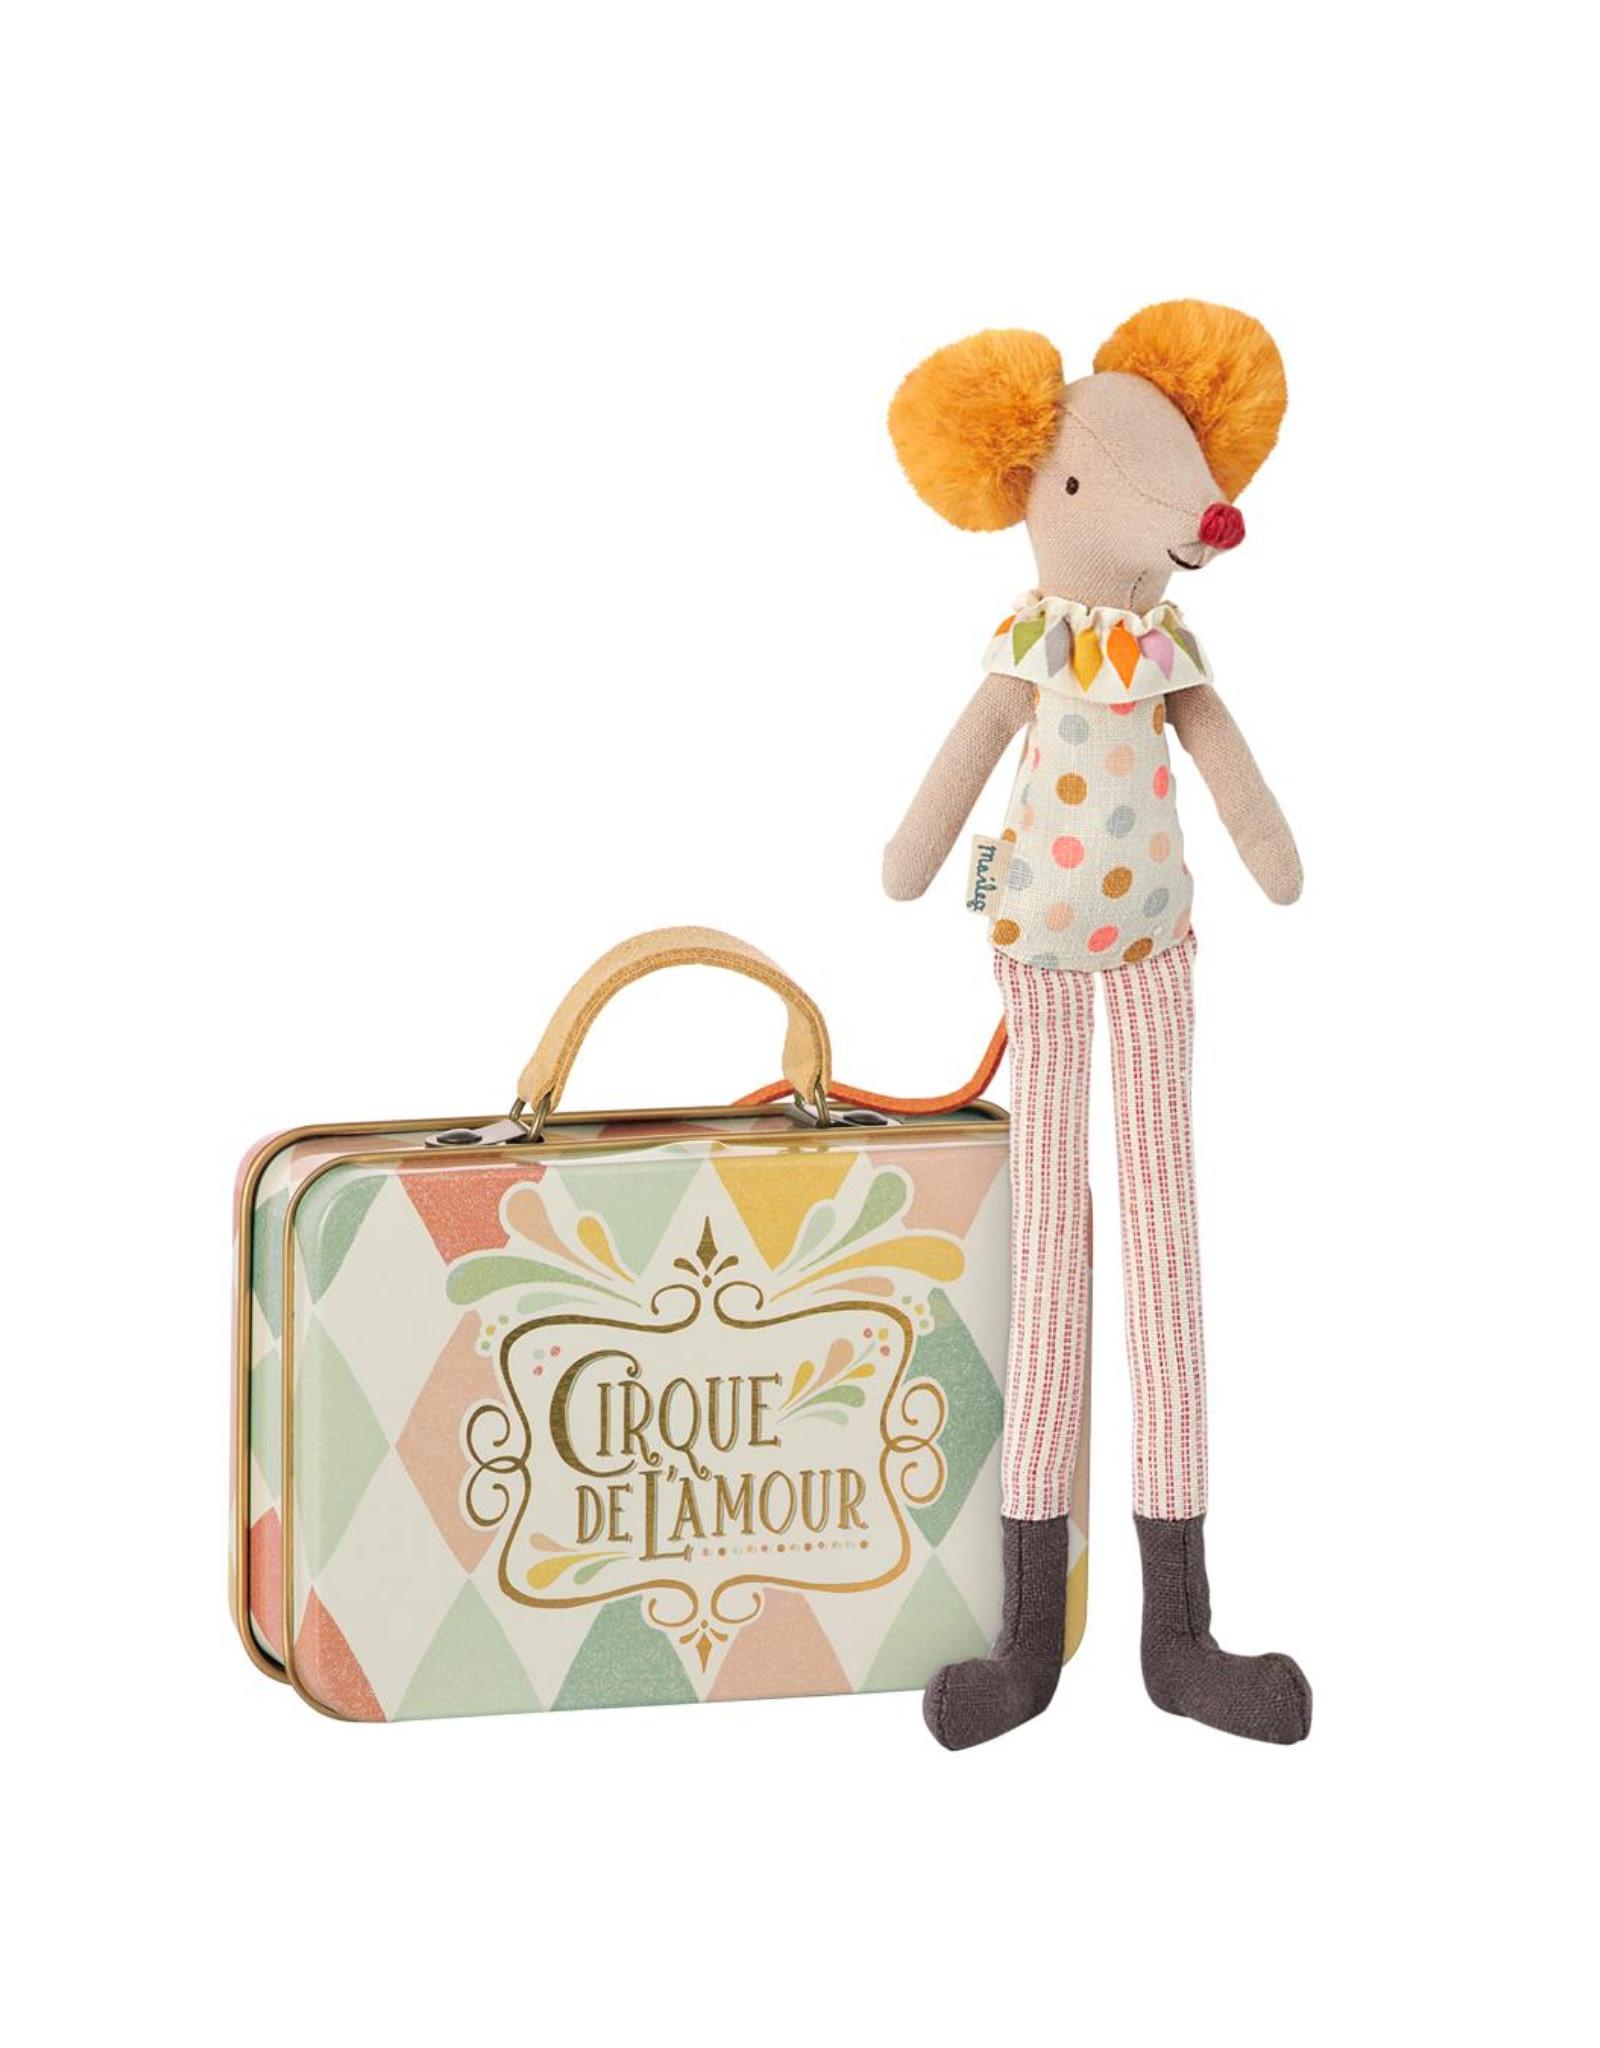 Maileg Stilt clown mouse in suitcase